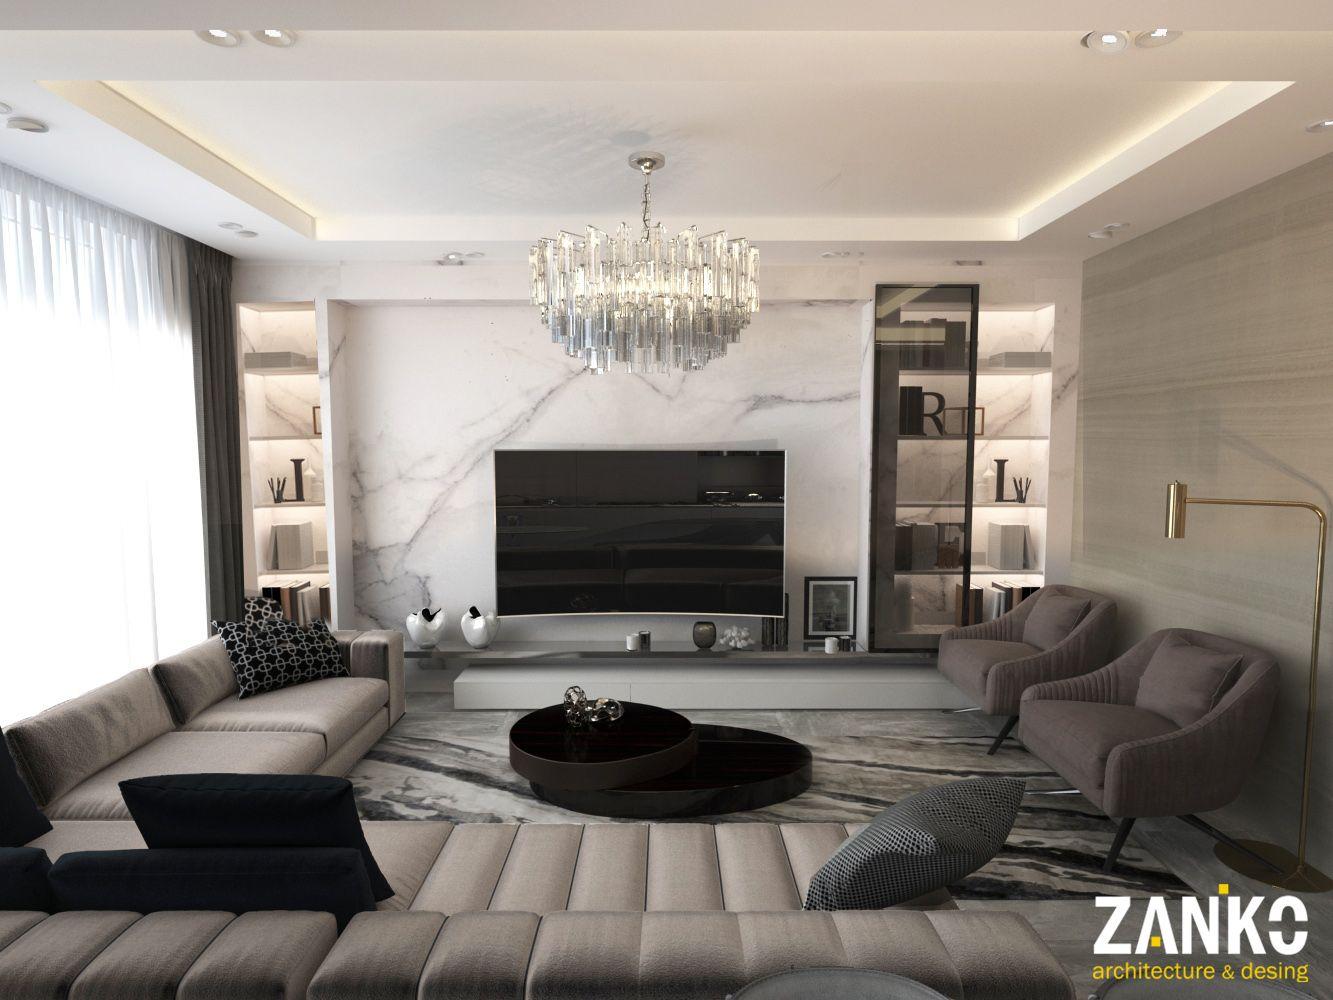 Armani Interior By Zanko Design On Behance Luxury Living Room Luxury Dining Room Modern Tv Room